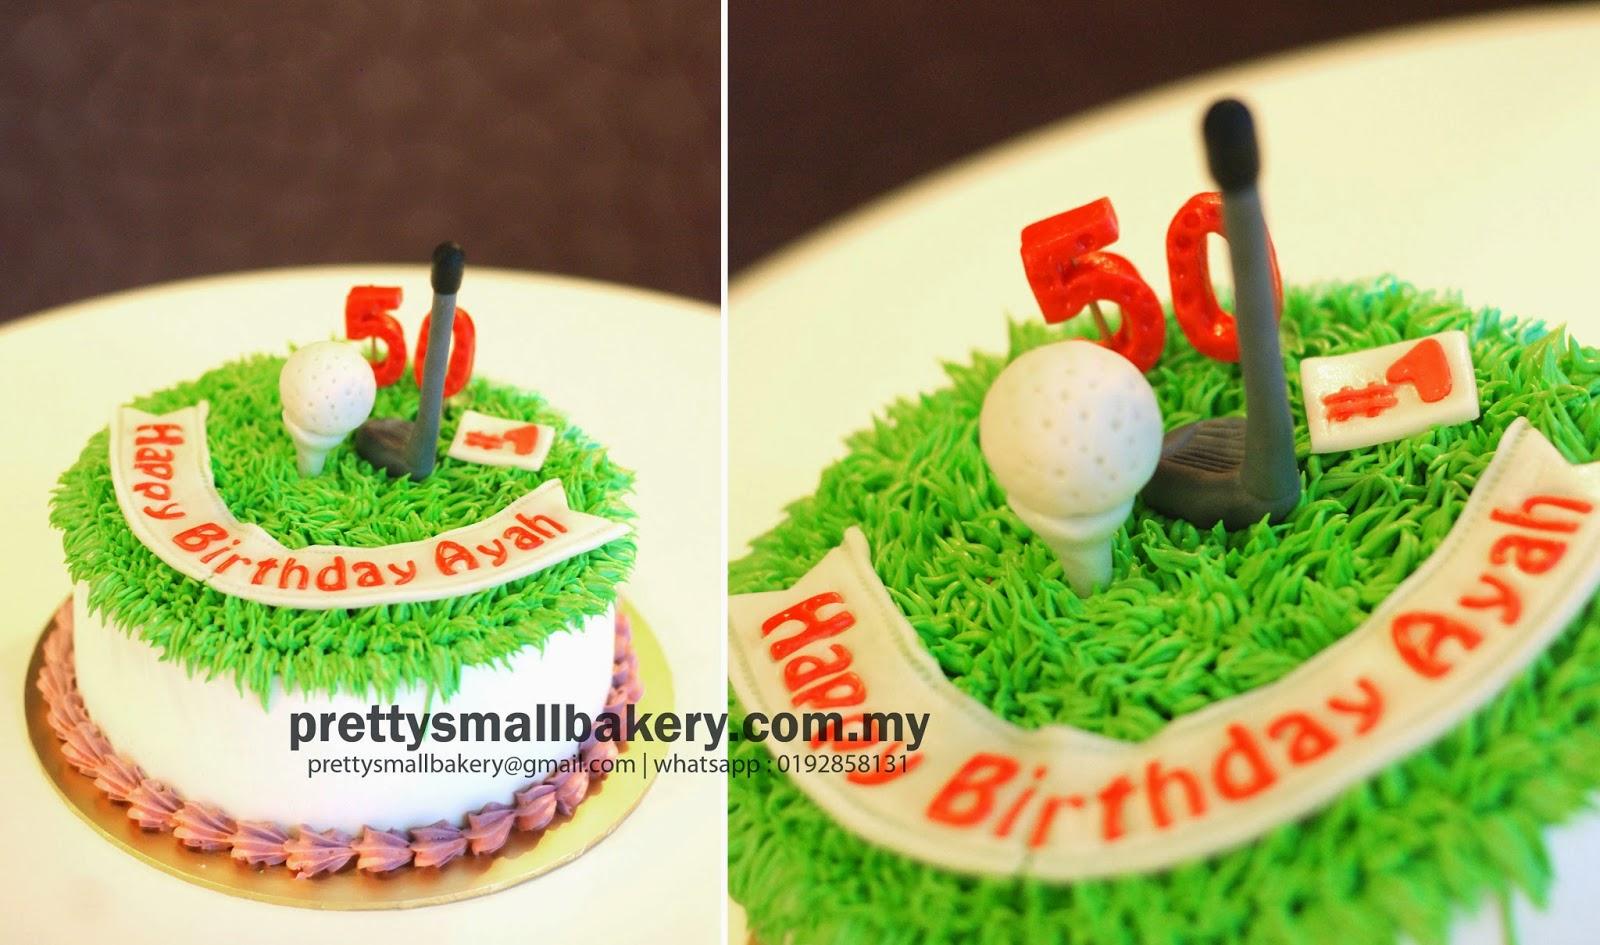 Kek Harijadi Untuk Golfer Prettysmallbakery